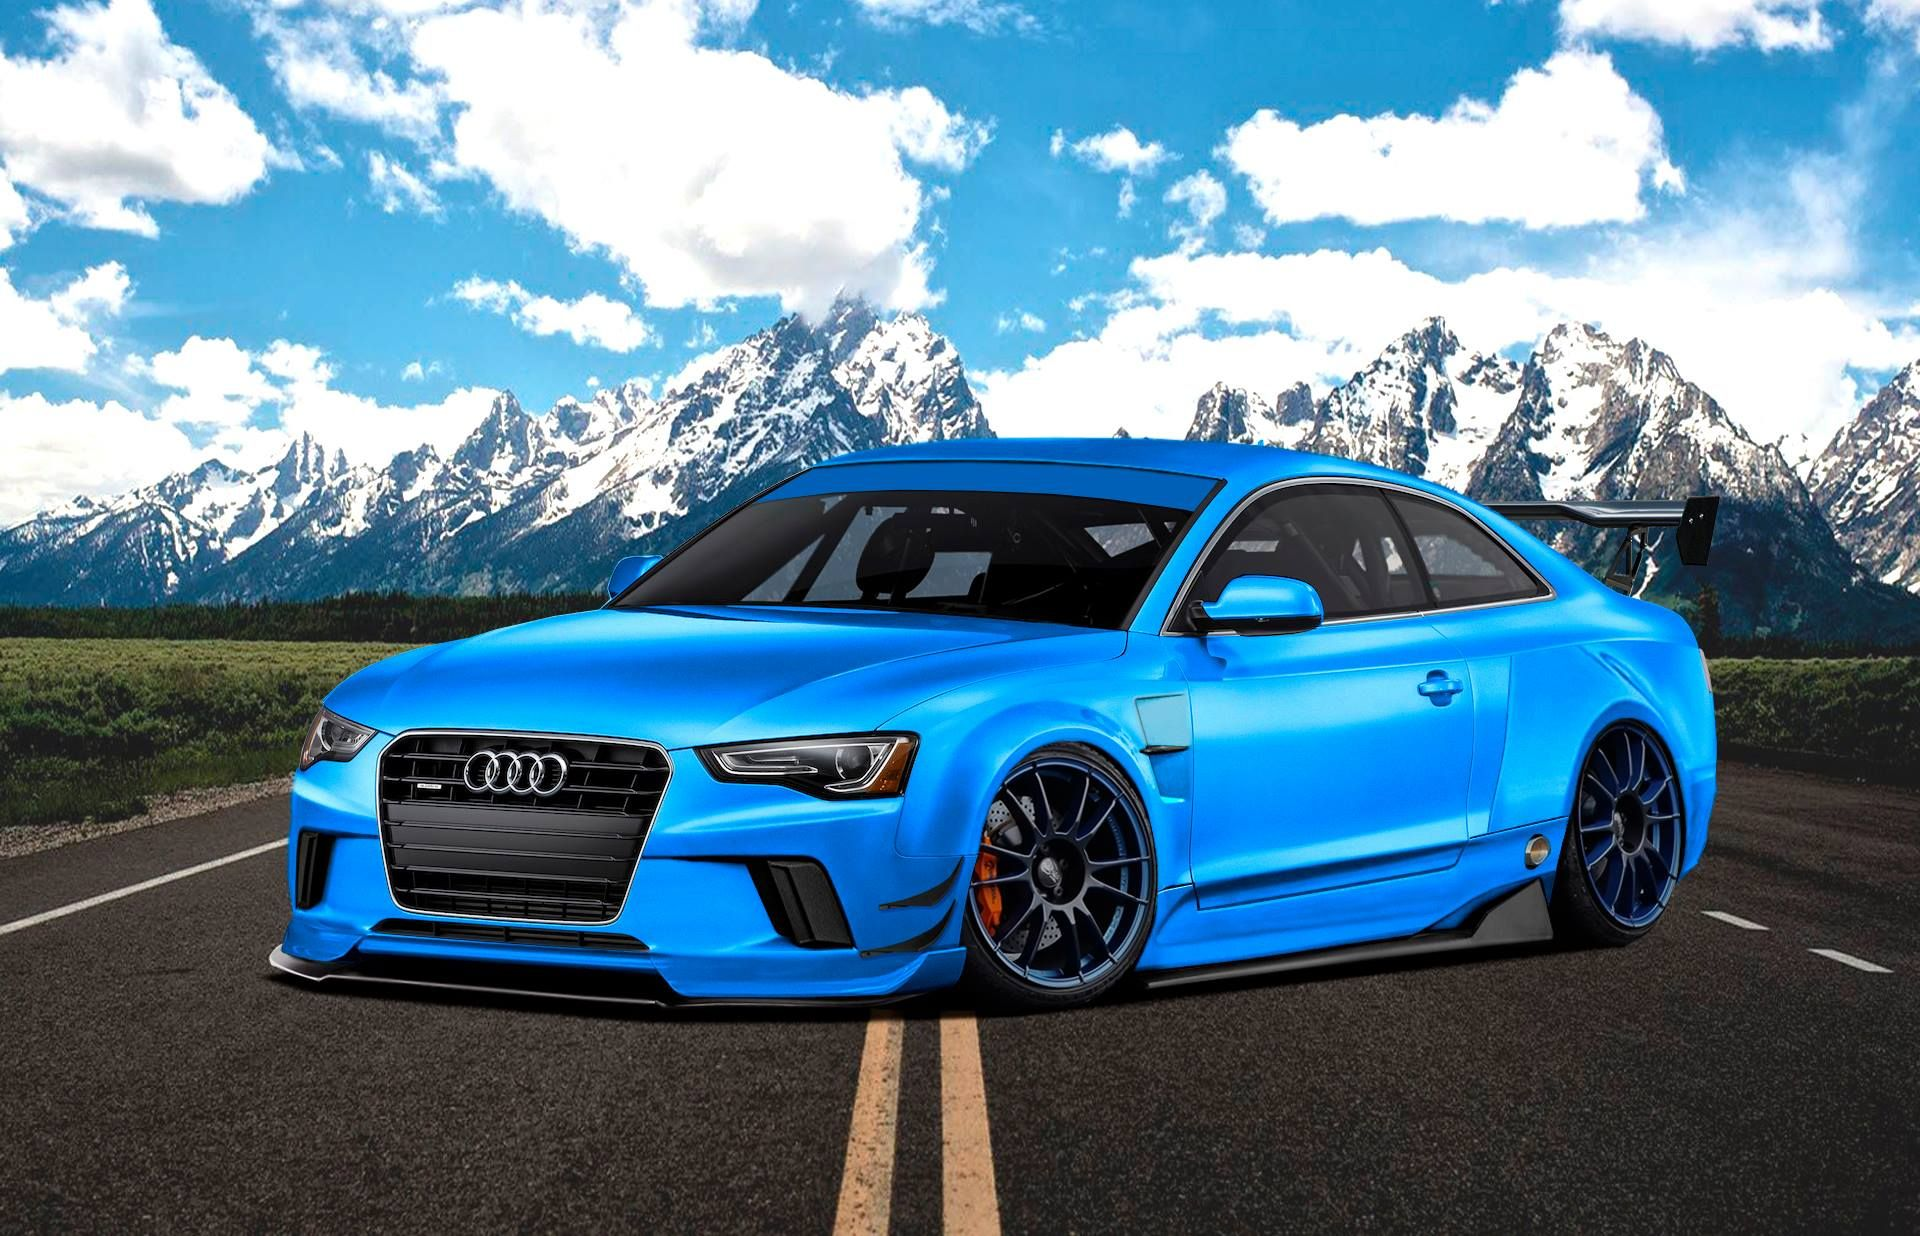 Audi A5 Like